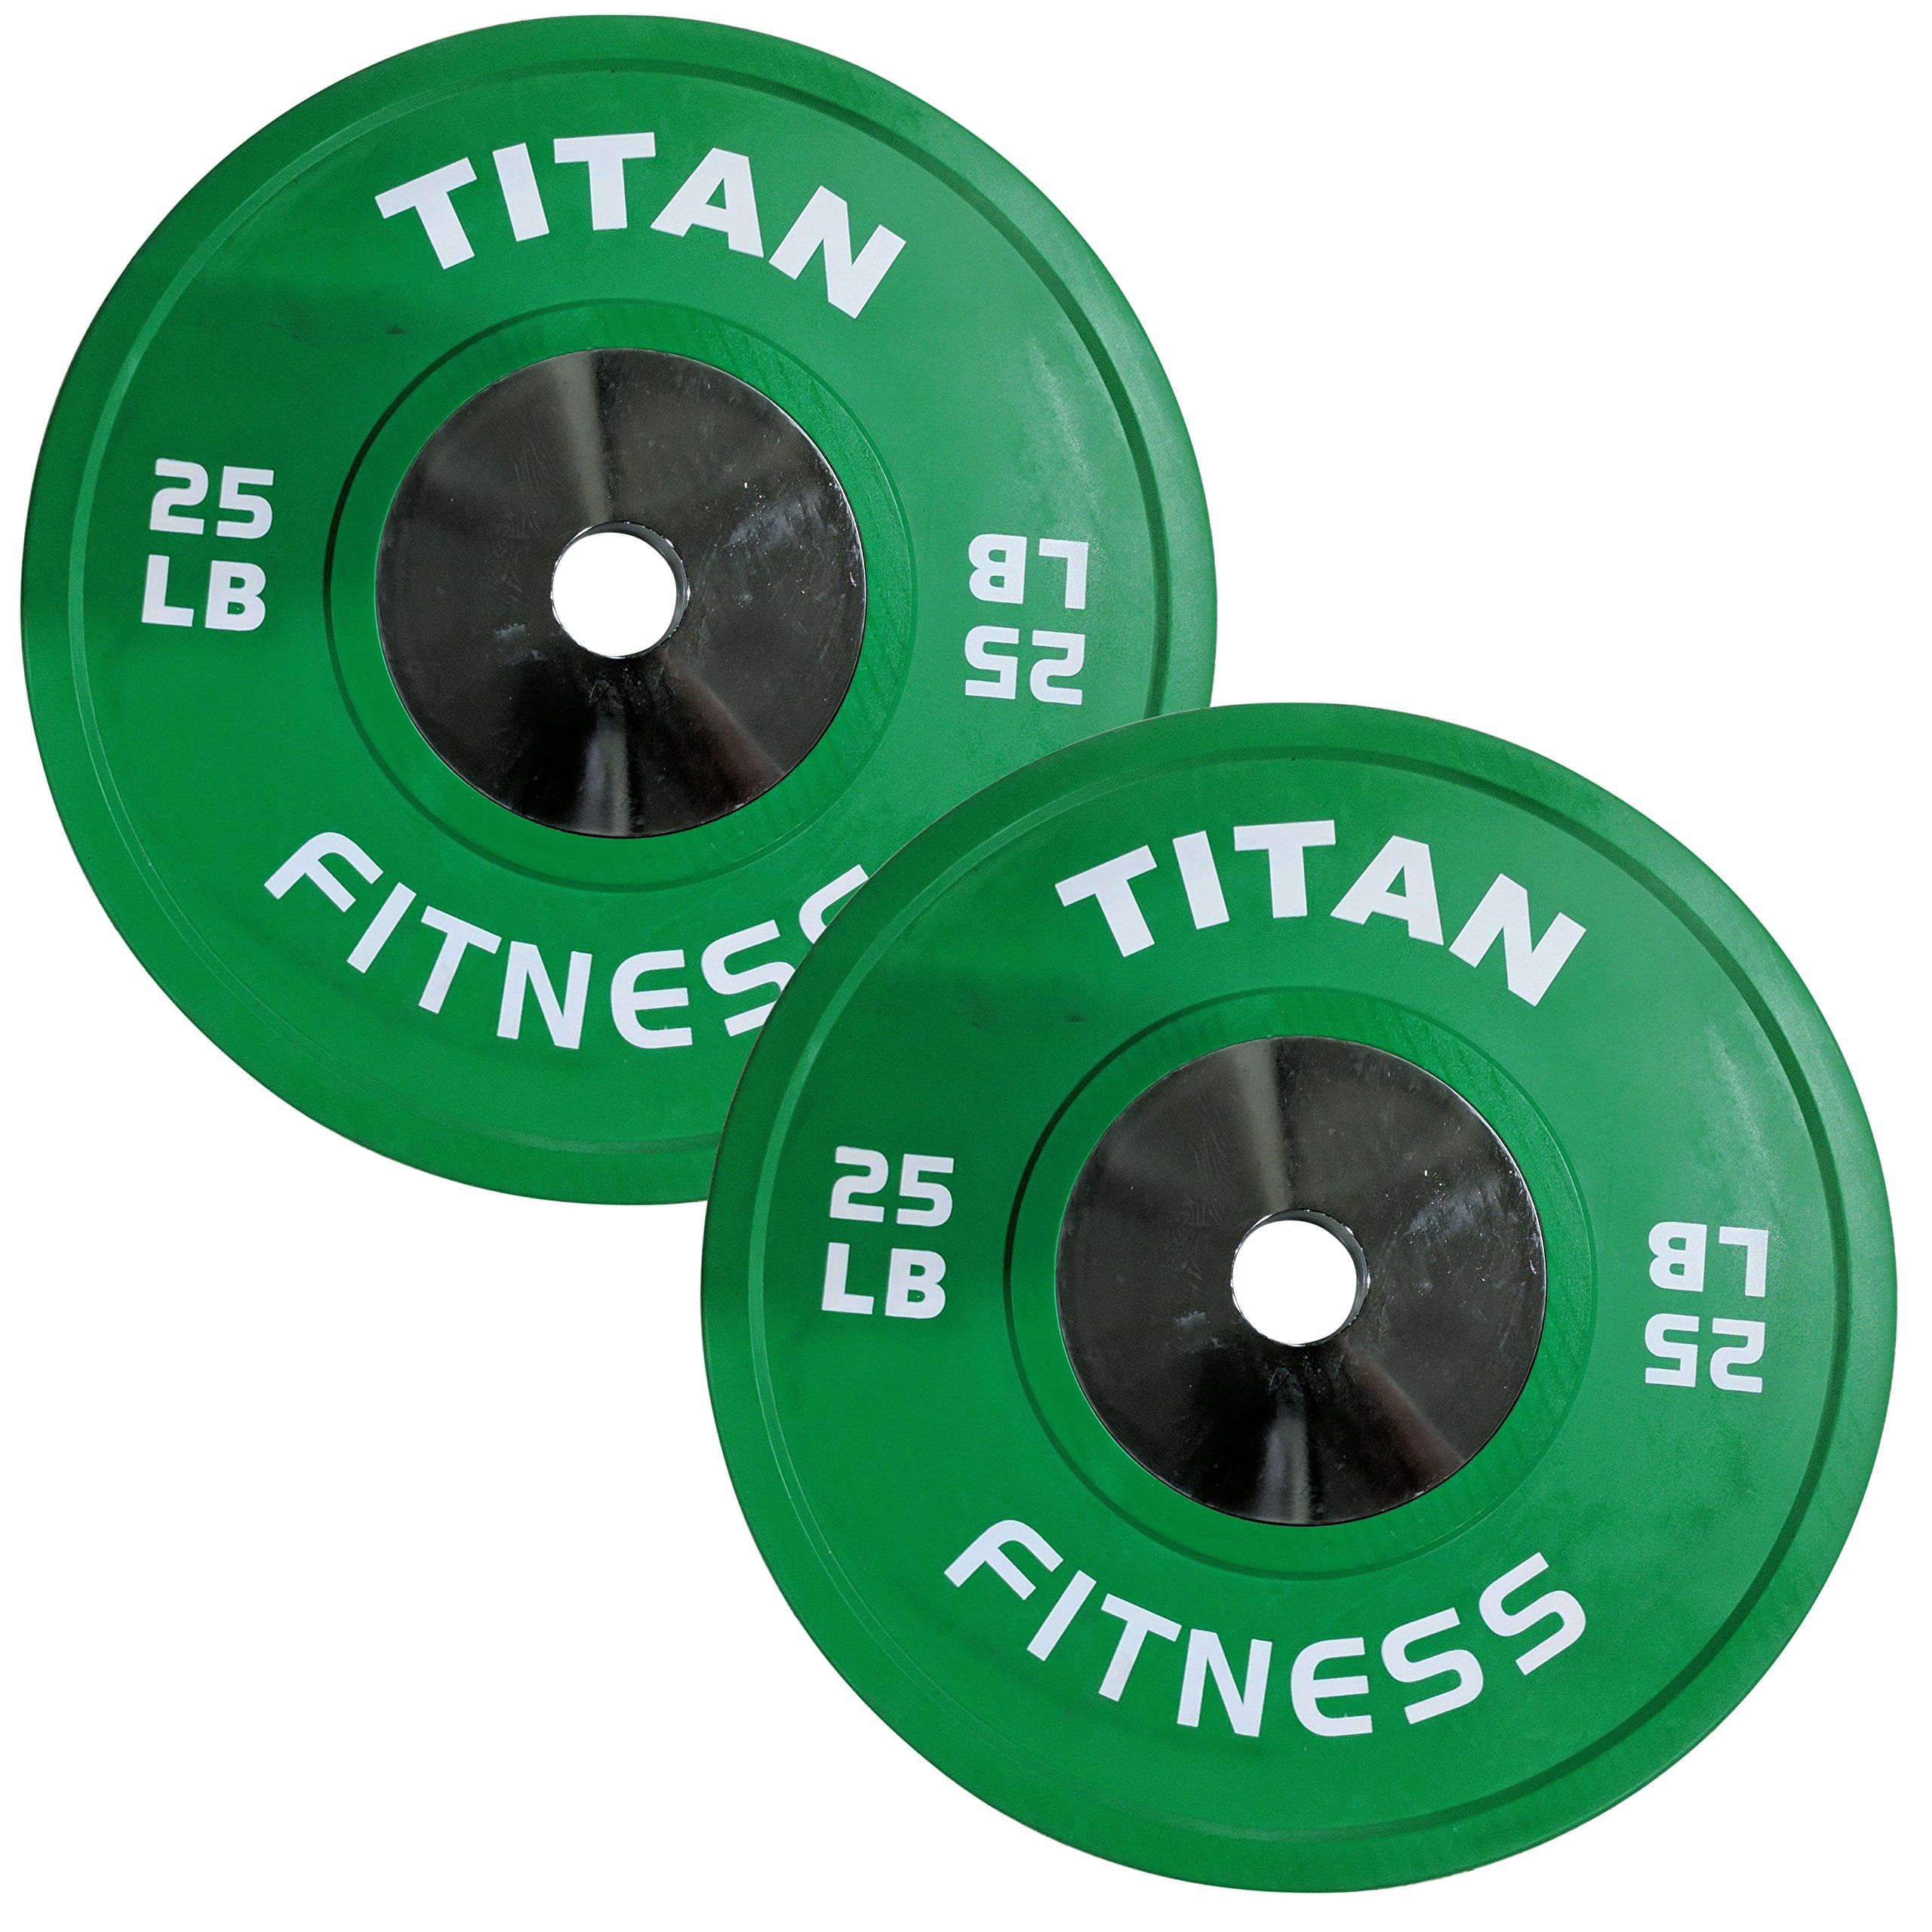 Pair of Titan Color Elite Olympic Bumper Plates - 25 LB